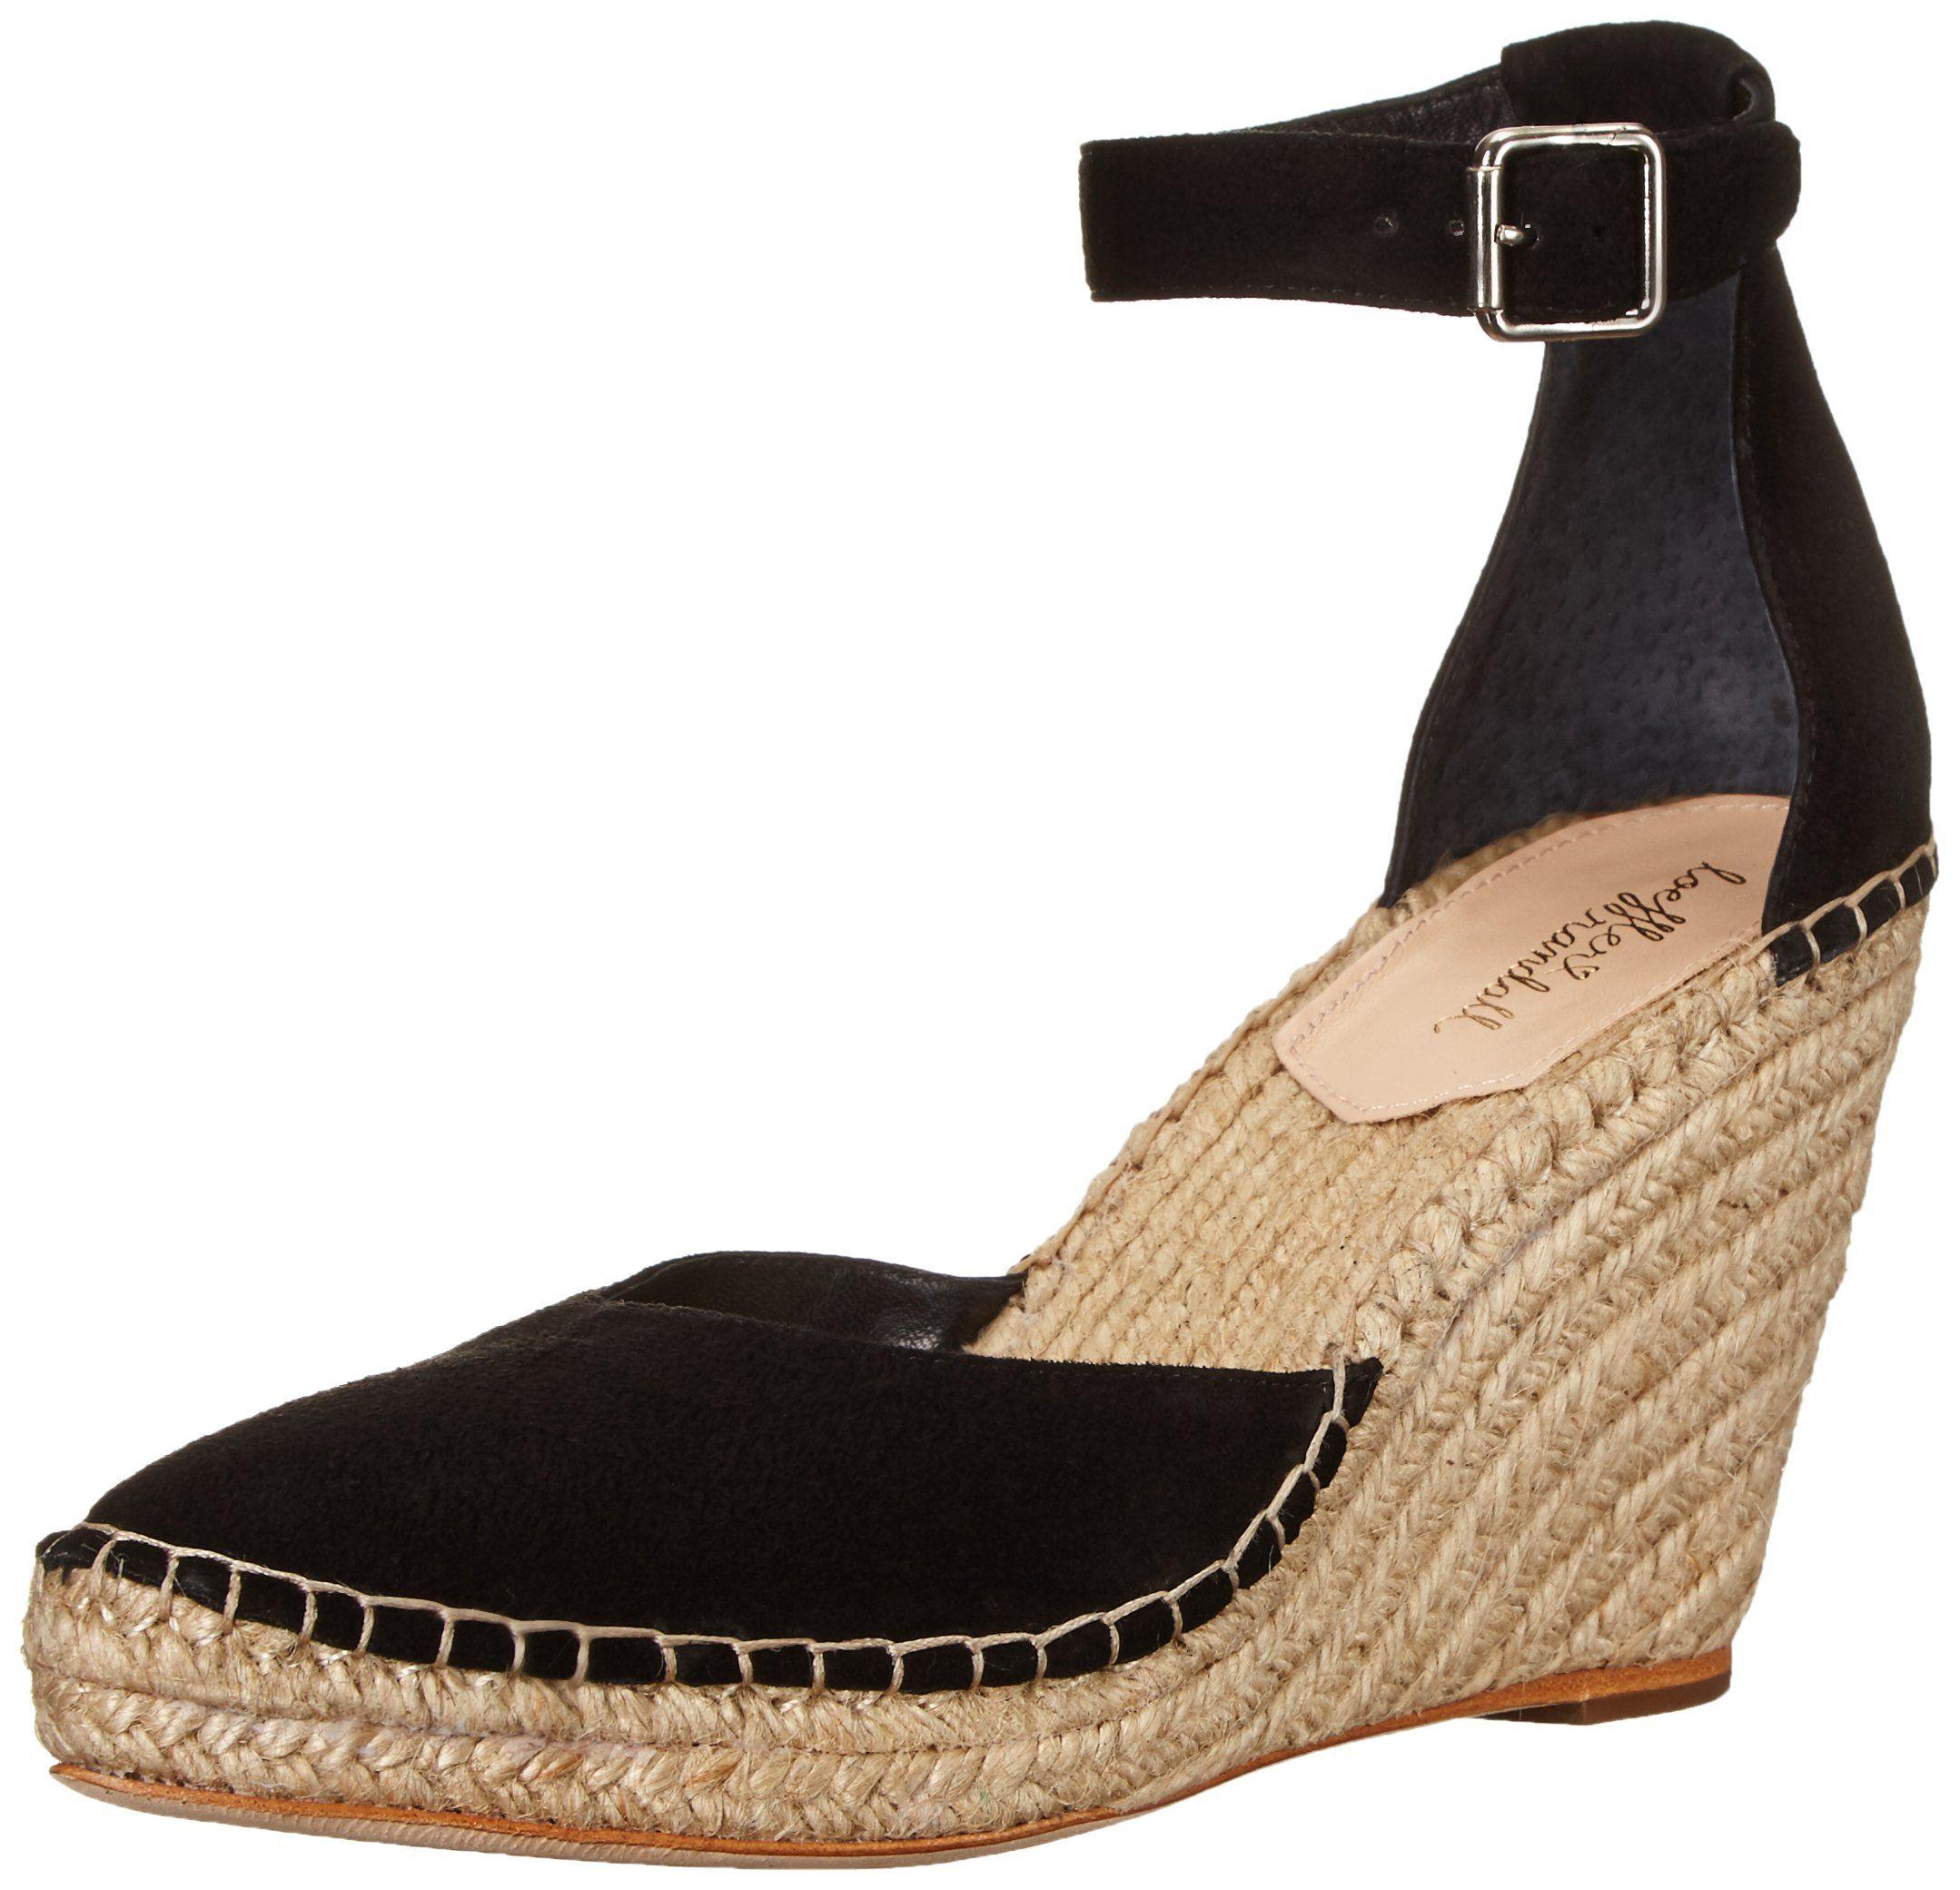 Loeffler Randall Woman Suede Espadrille Sandals Black Size 8.5 Loeffler Randall Eastbay Cheap Online R8joce4U